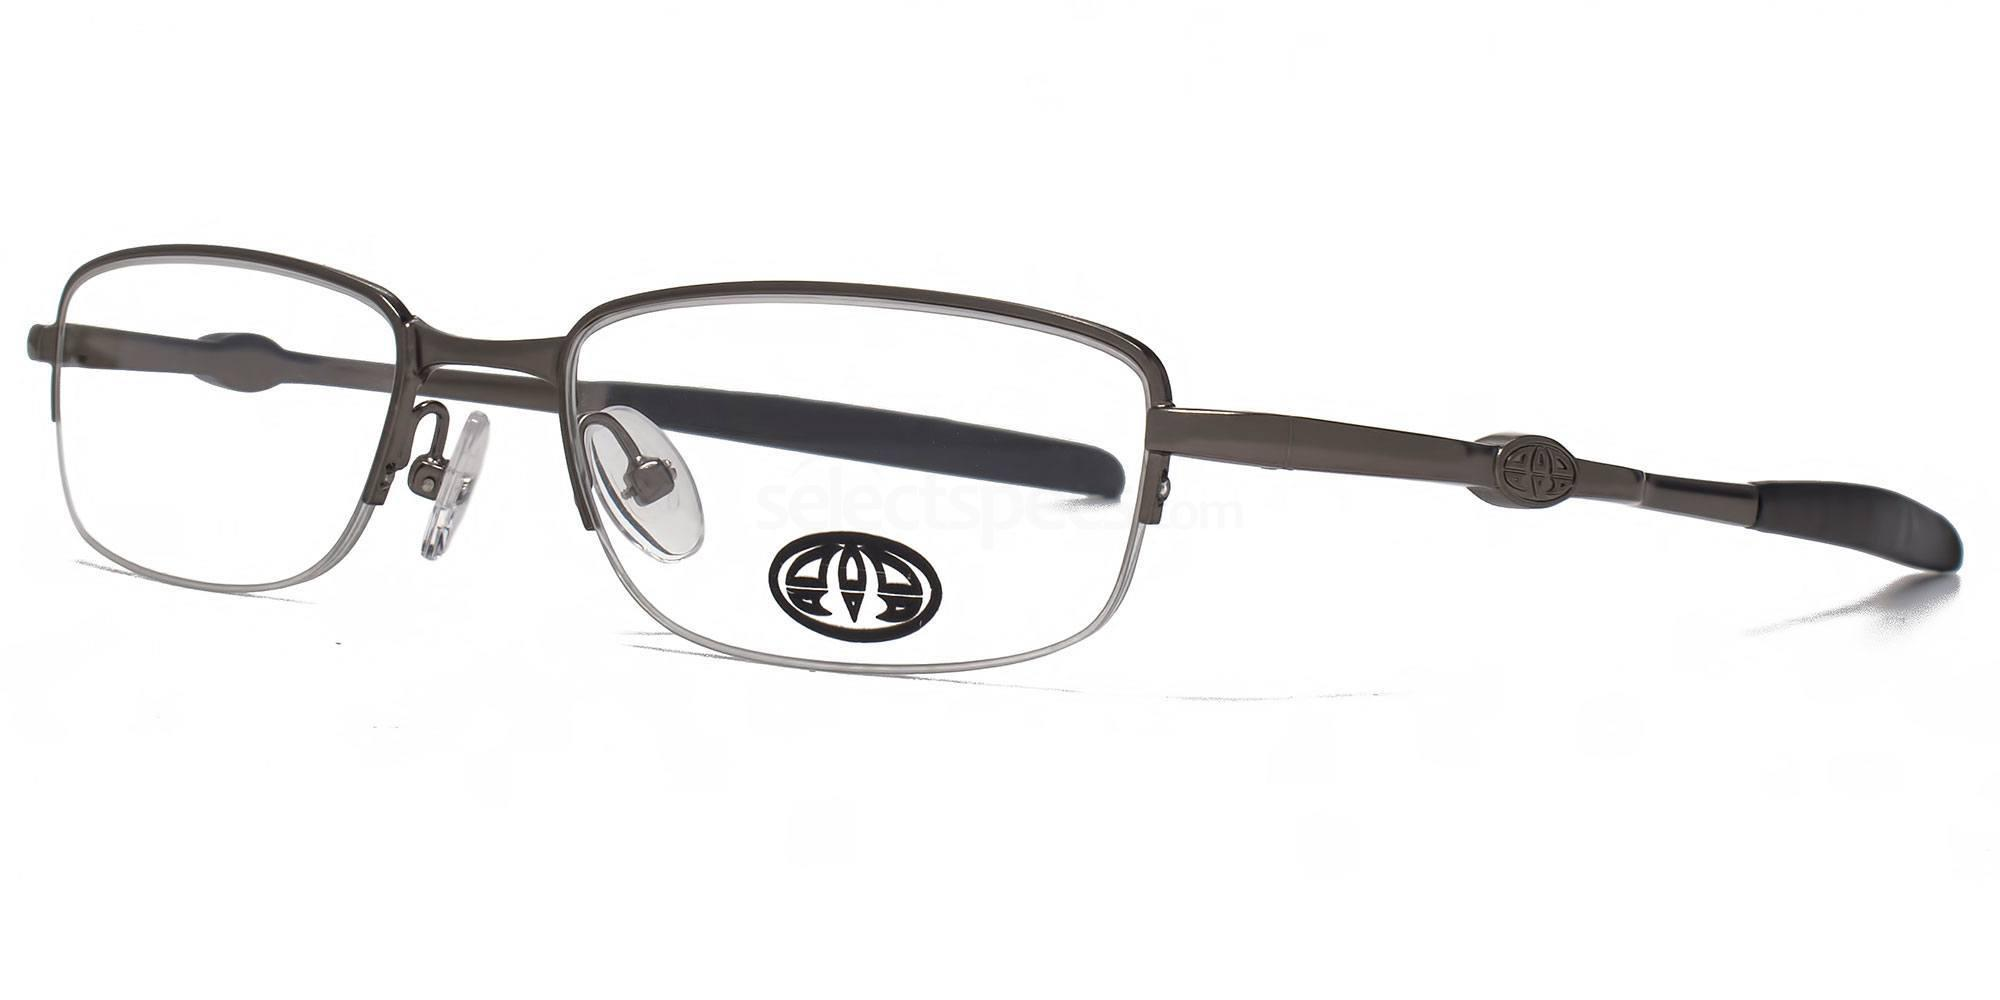 DGUN ANIS010 - HARINGTON Glasses, Animal